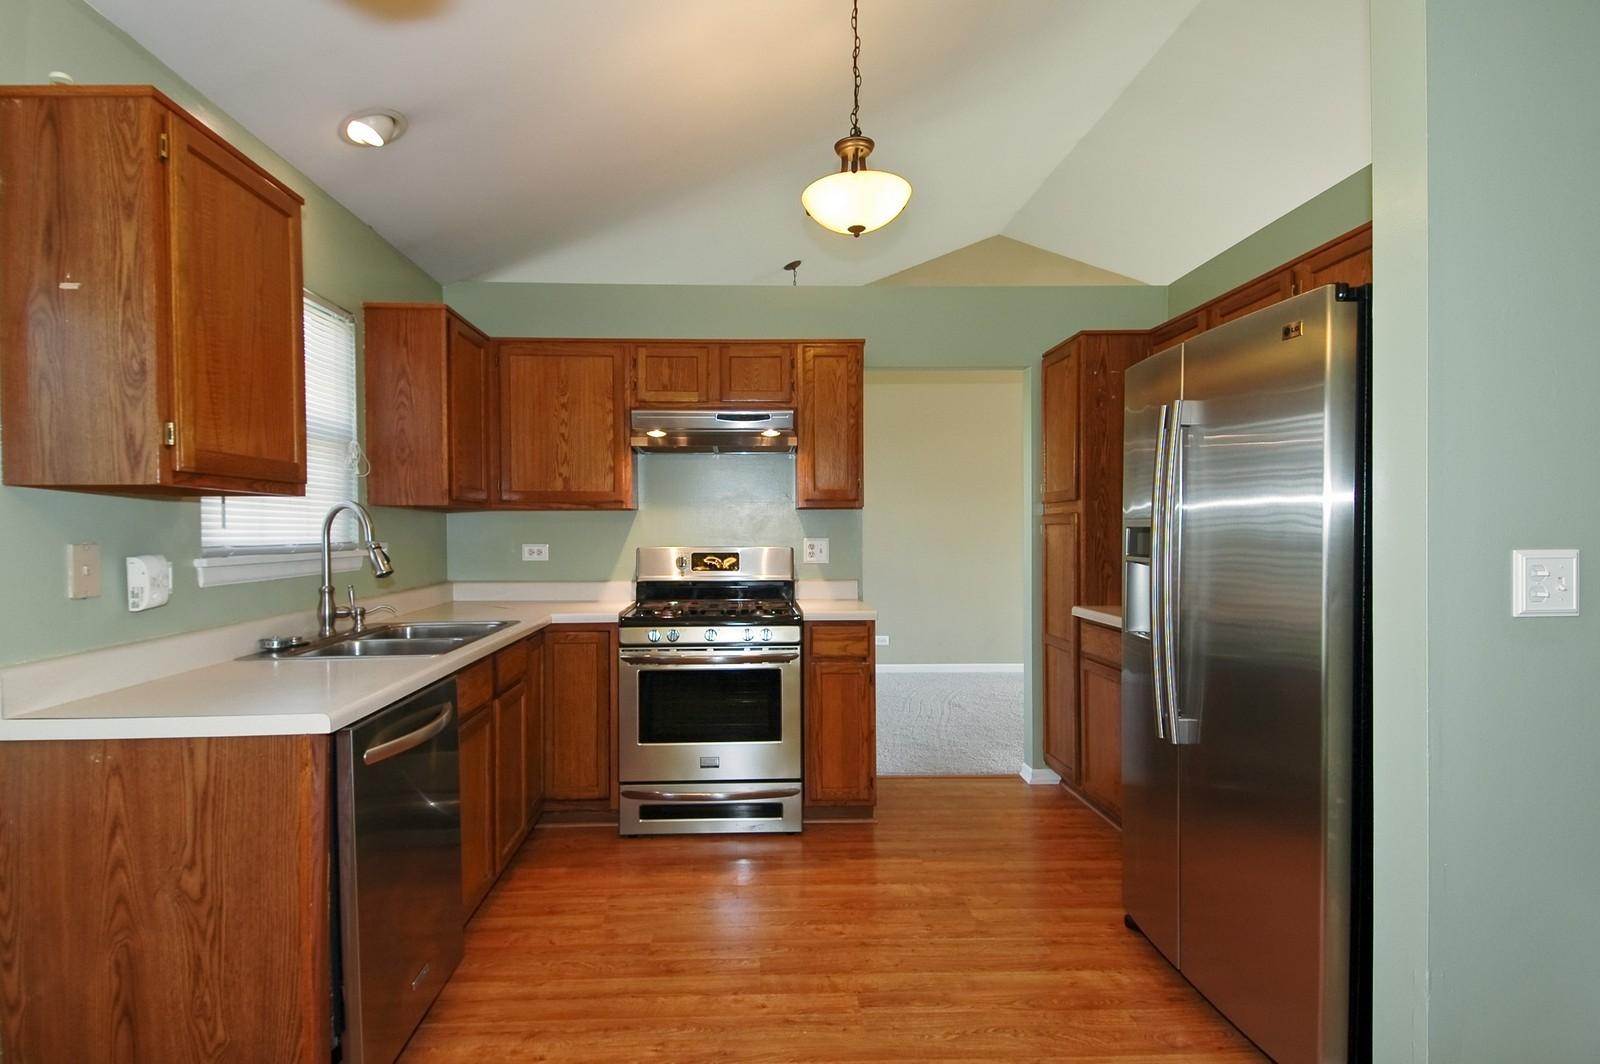 Real Estate Photography - 1700 Brompton Ln, Crystal Lake, IL, 60014 - Kitchen